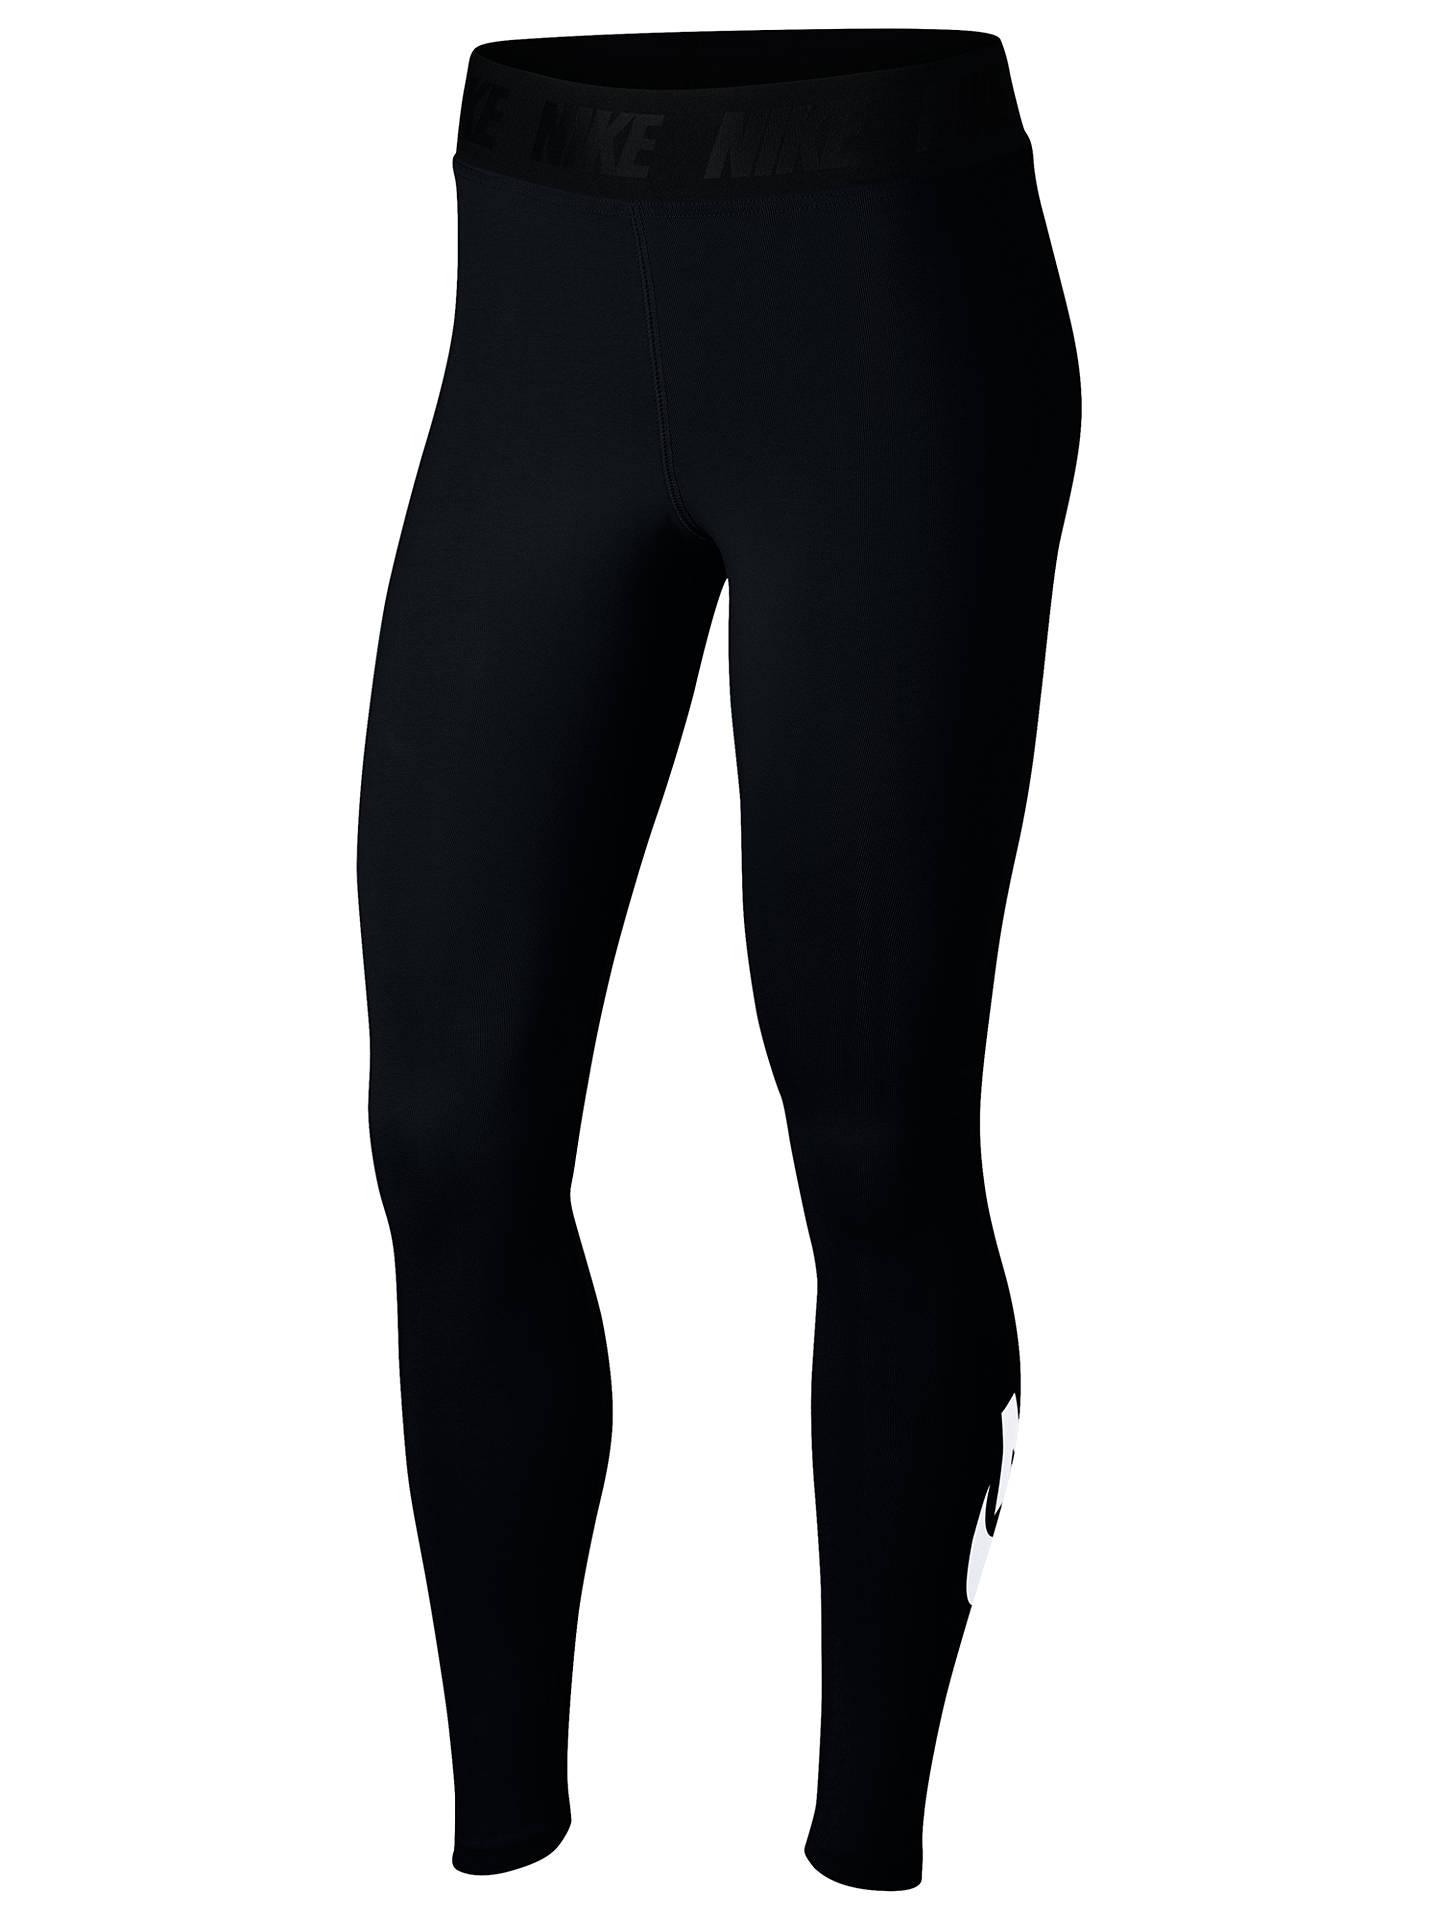 f195d2523be93 Buy Nike Sportswear Leg-A-See Leggings, Black/White, XS Online ...